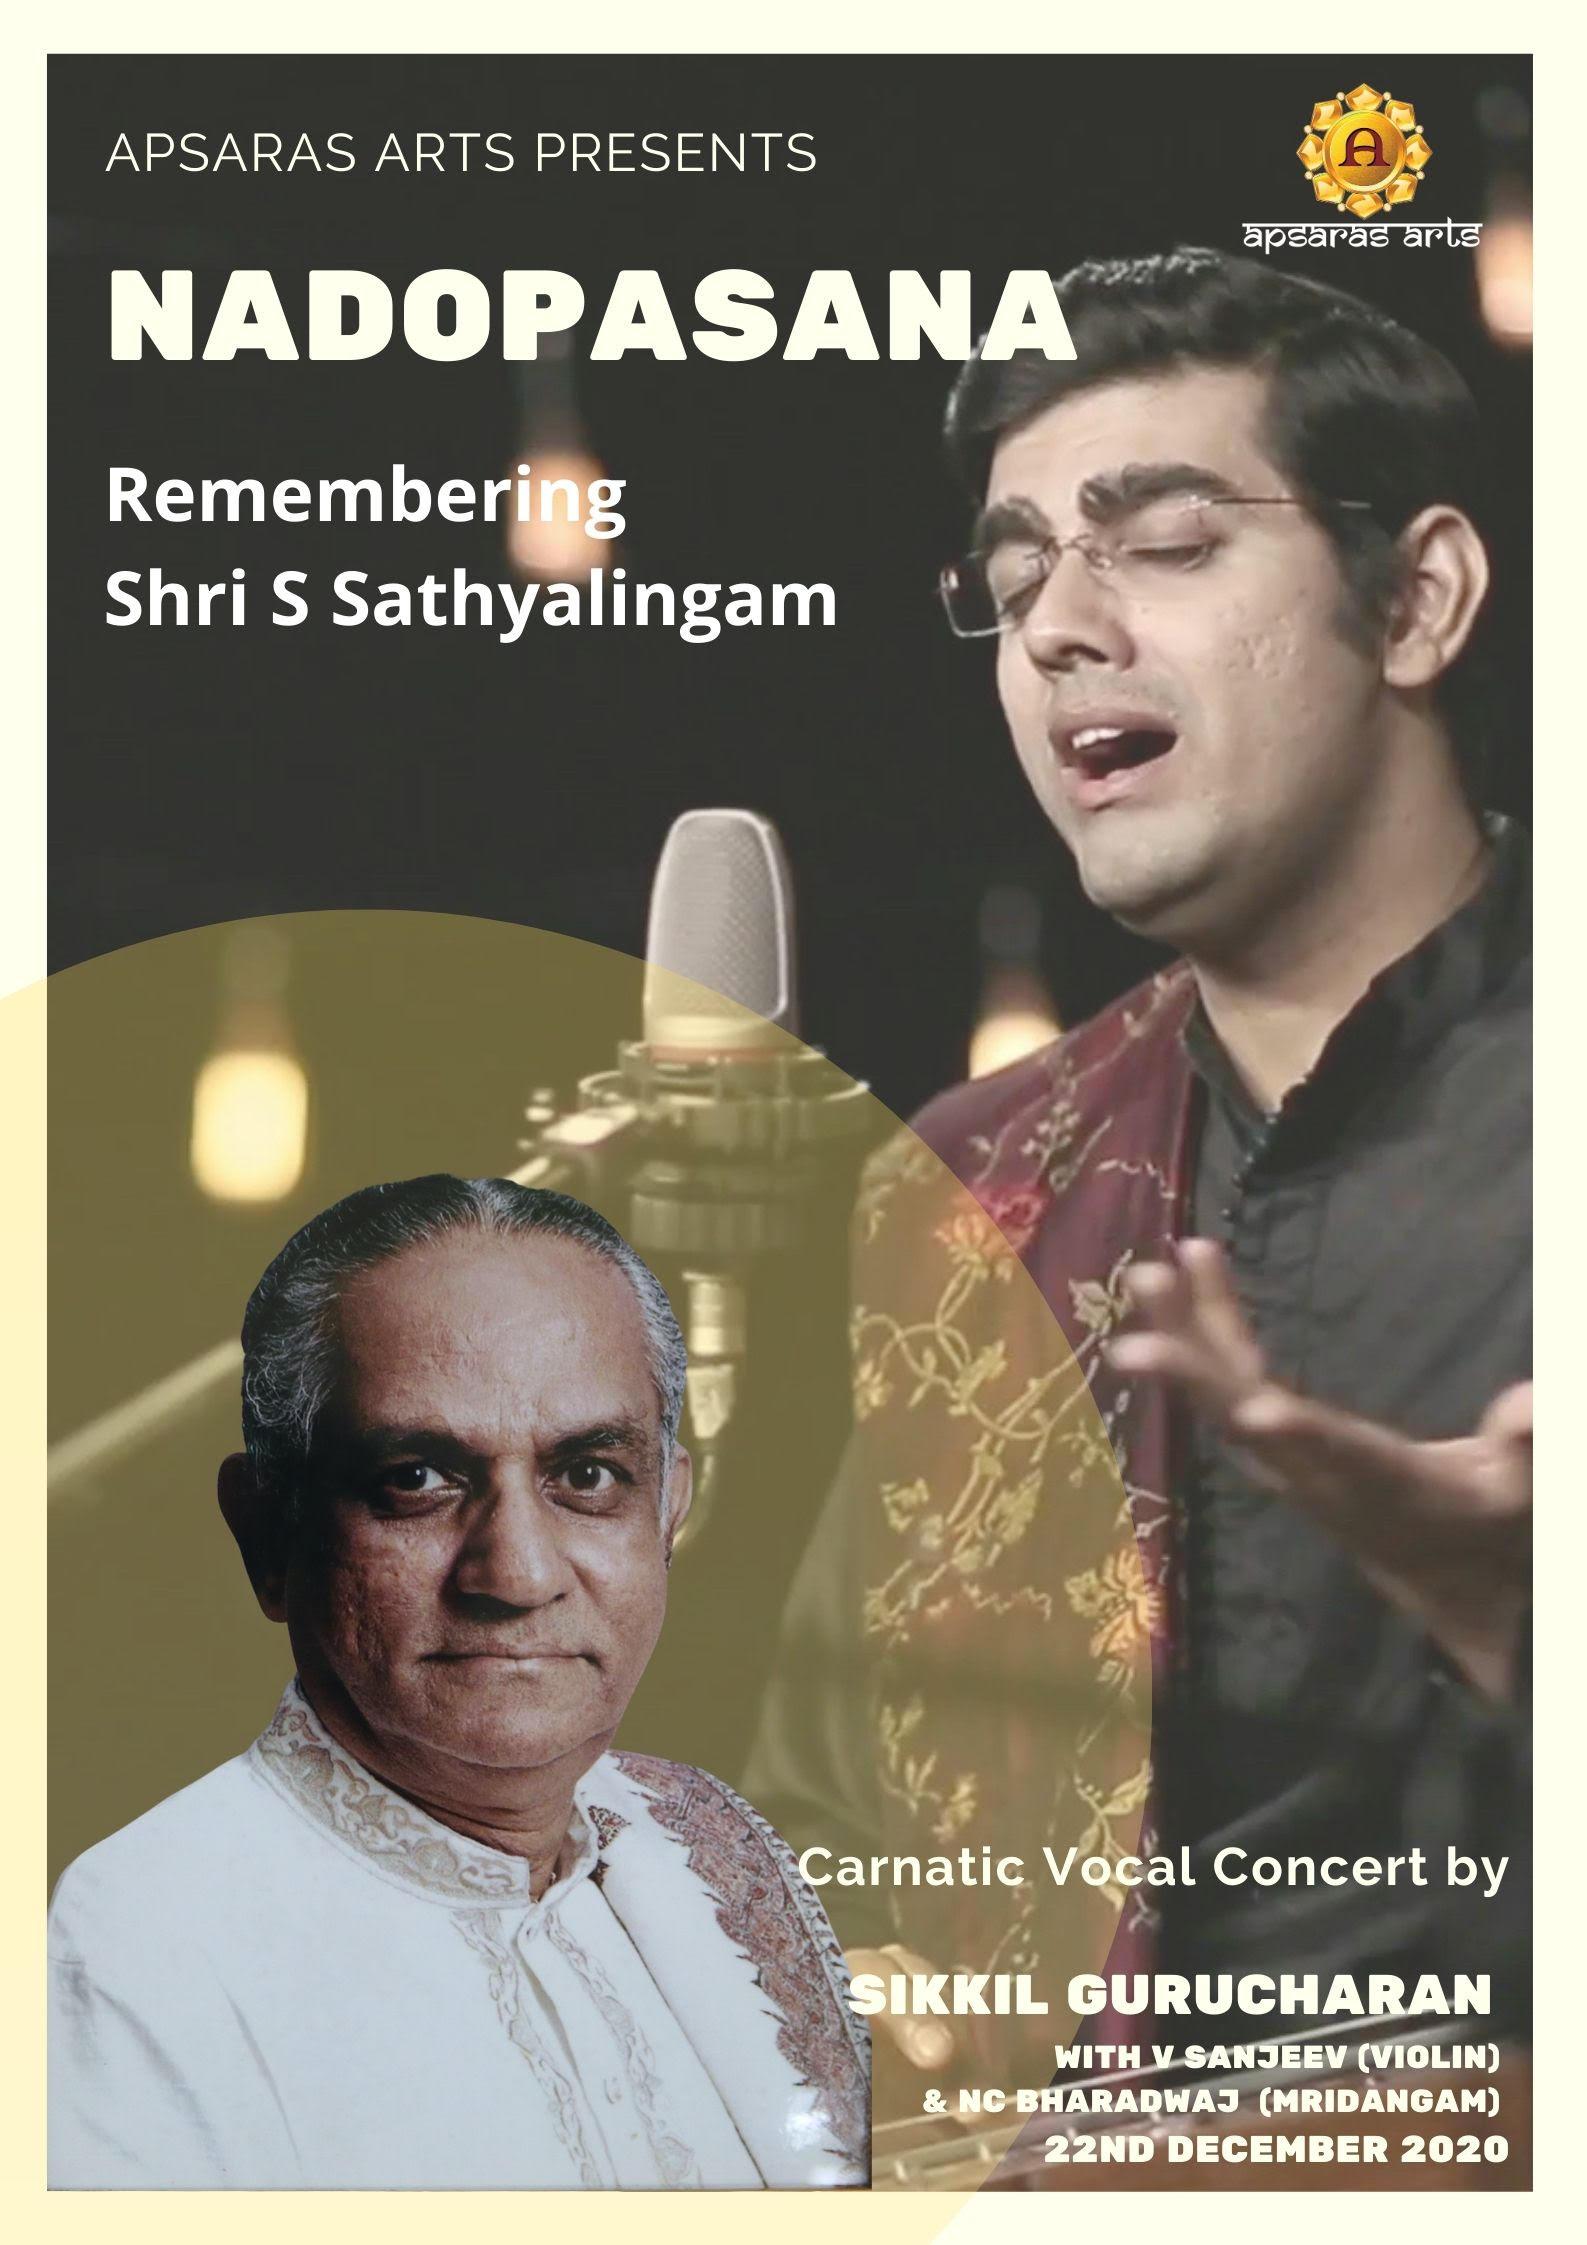 NADOPASANA - Remembering Shri S Sathyalingam  Carnatic Music Concert by Sikkil Gurucharan